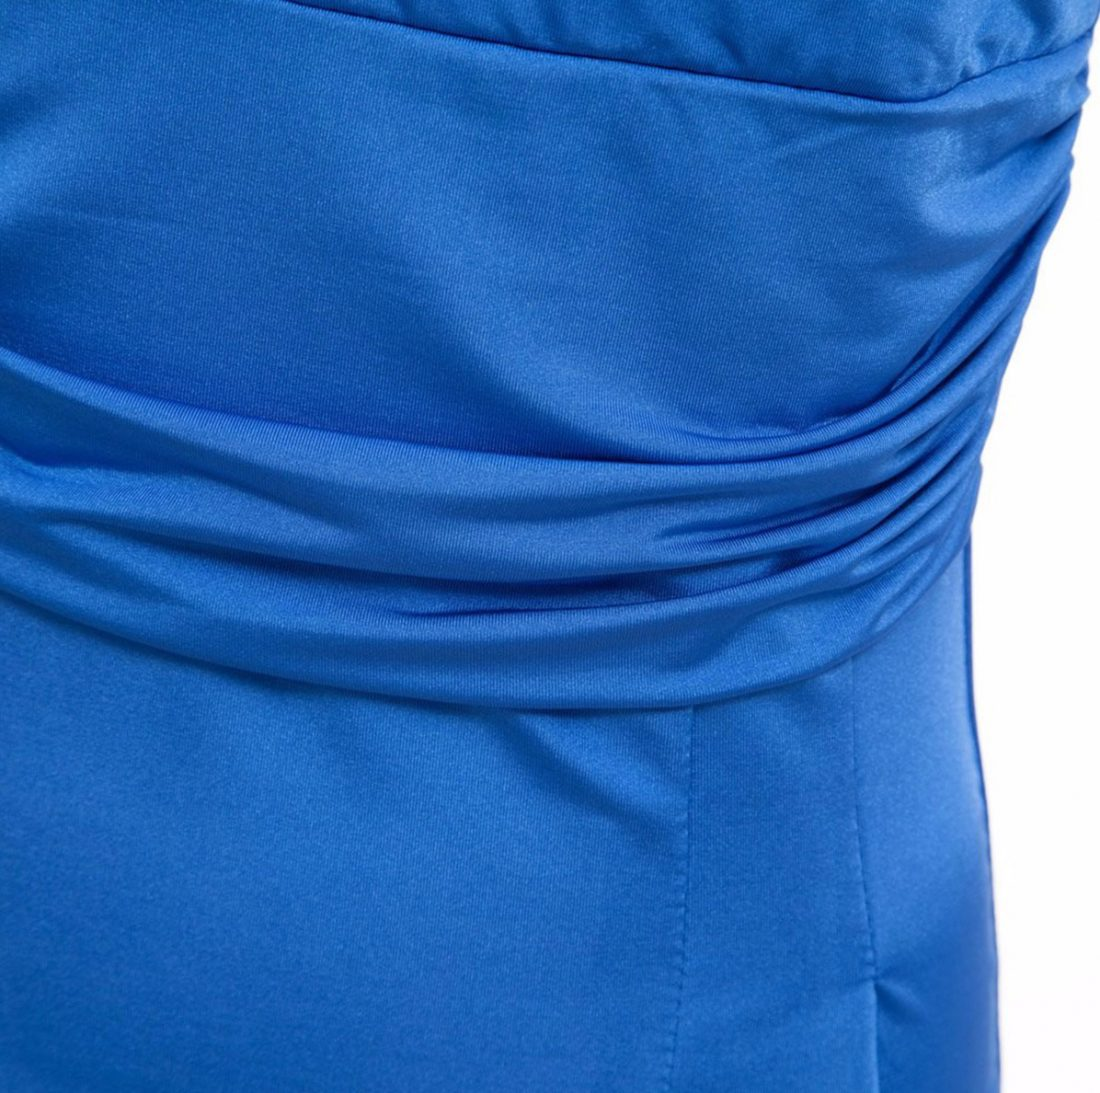 M0188 blue7 Short Sleeve Dresses maureens.com boutique